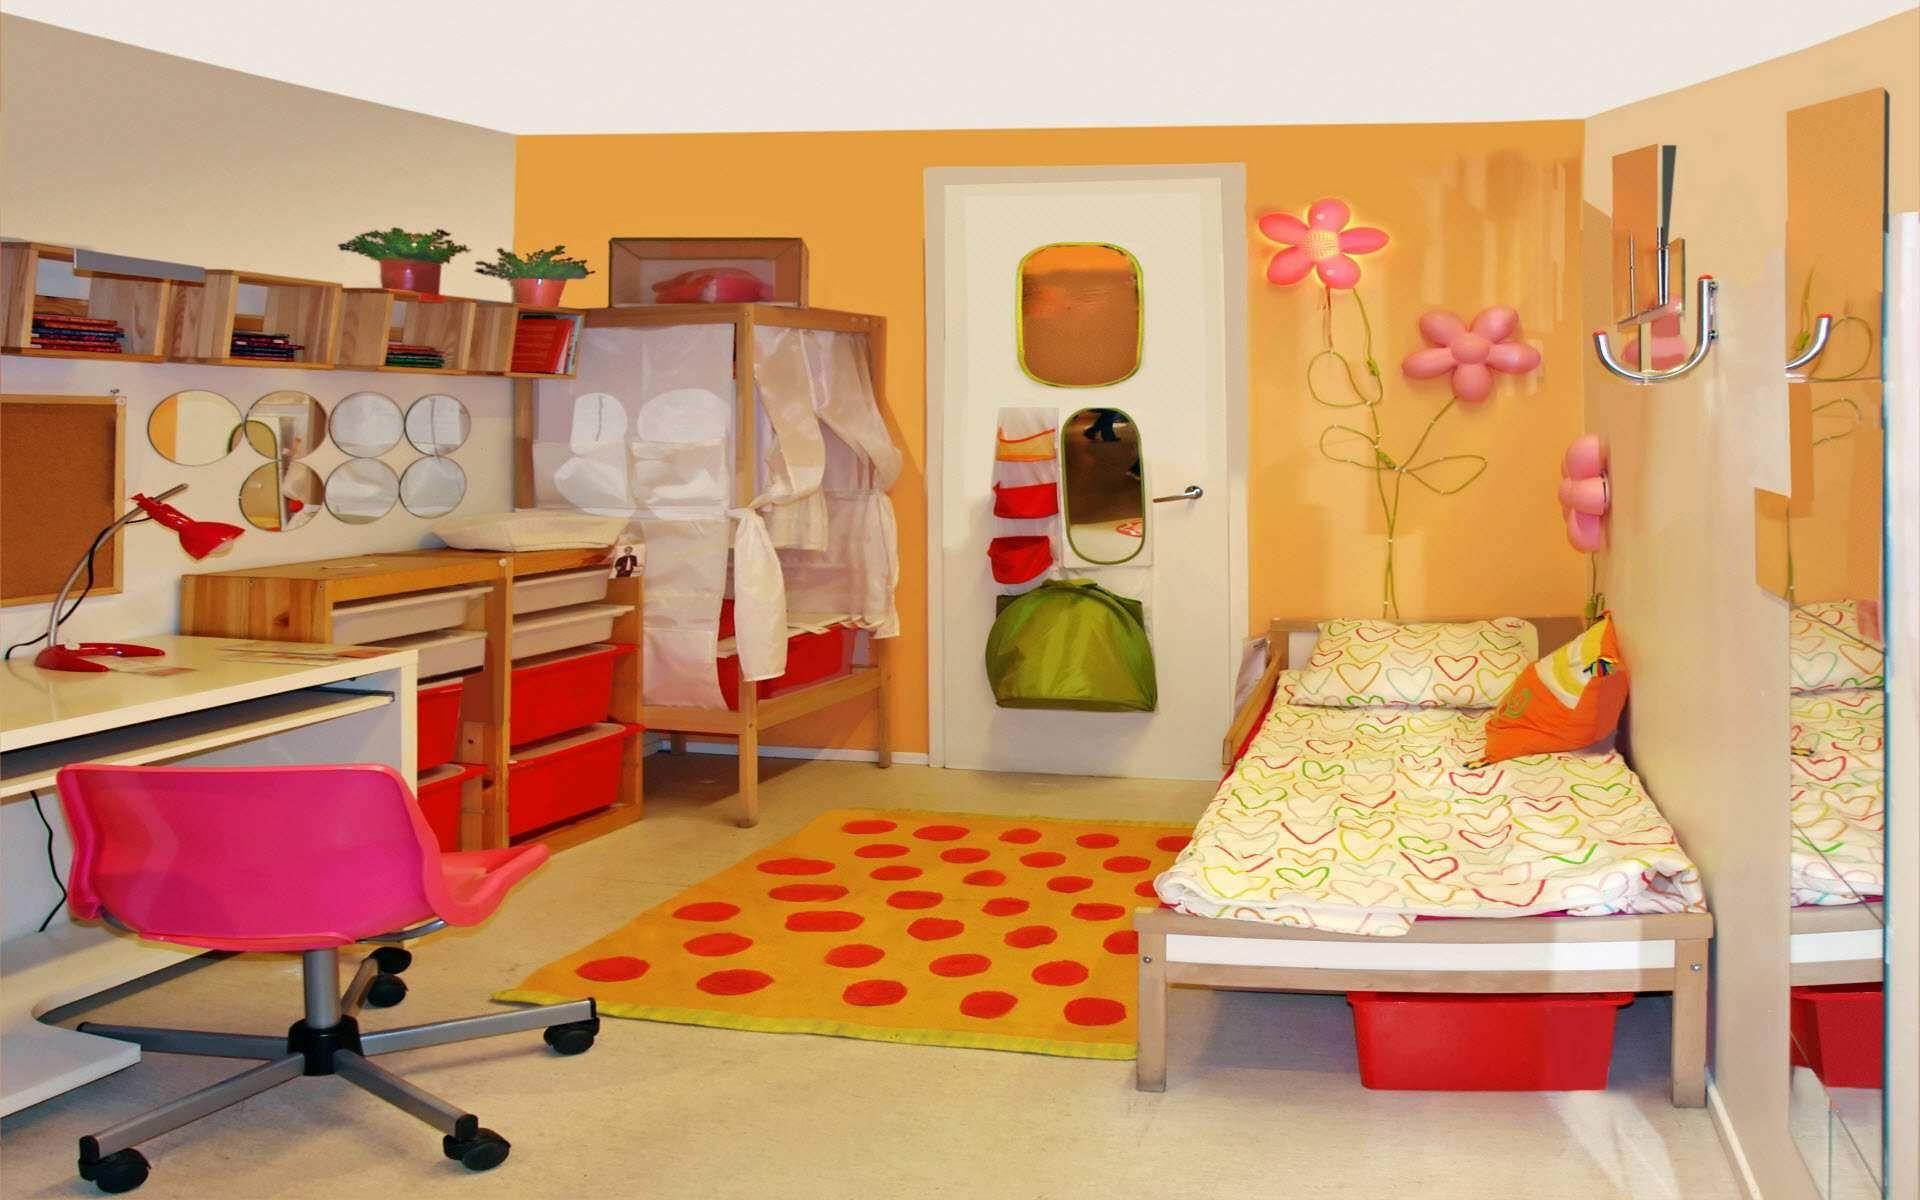 Interior Design For Kids Dorm Room Time To Get Organized College Pinterest  Kids